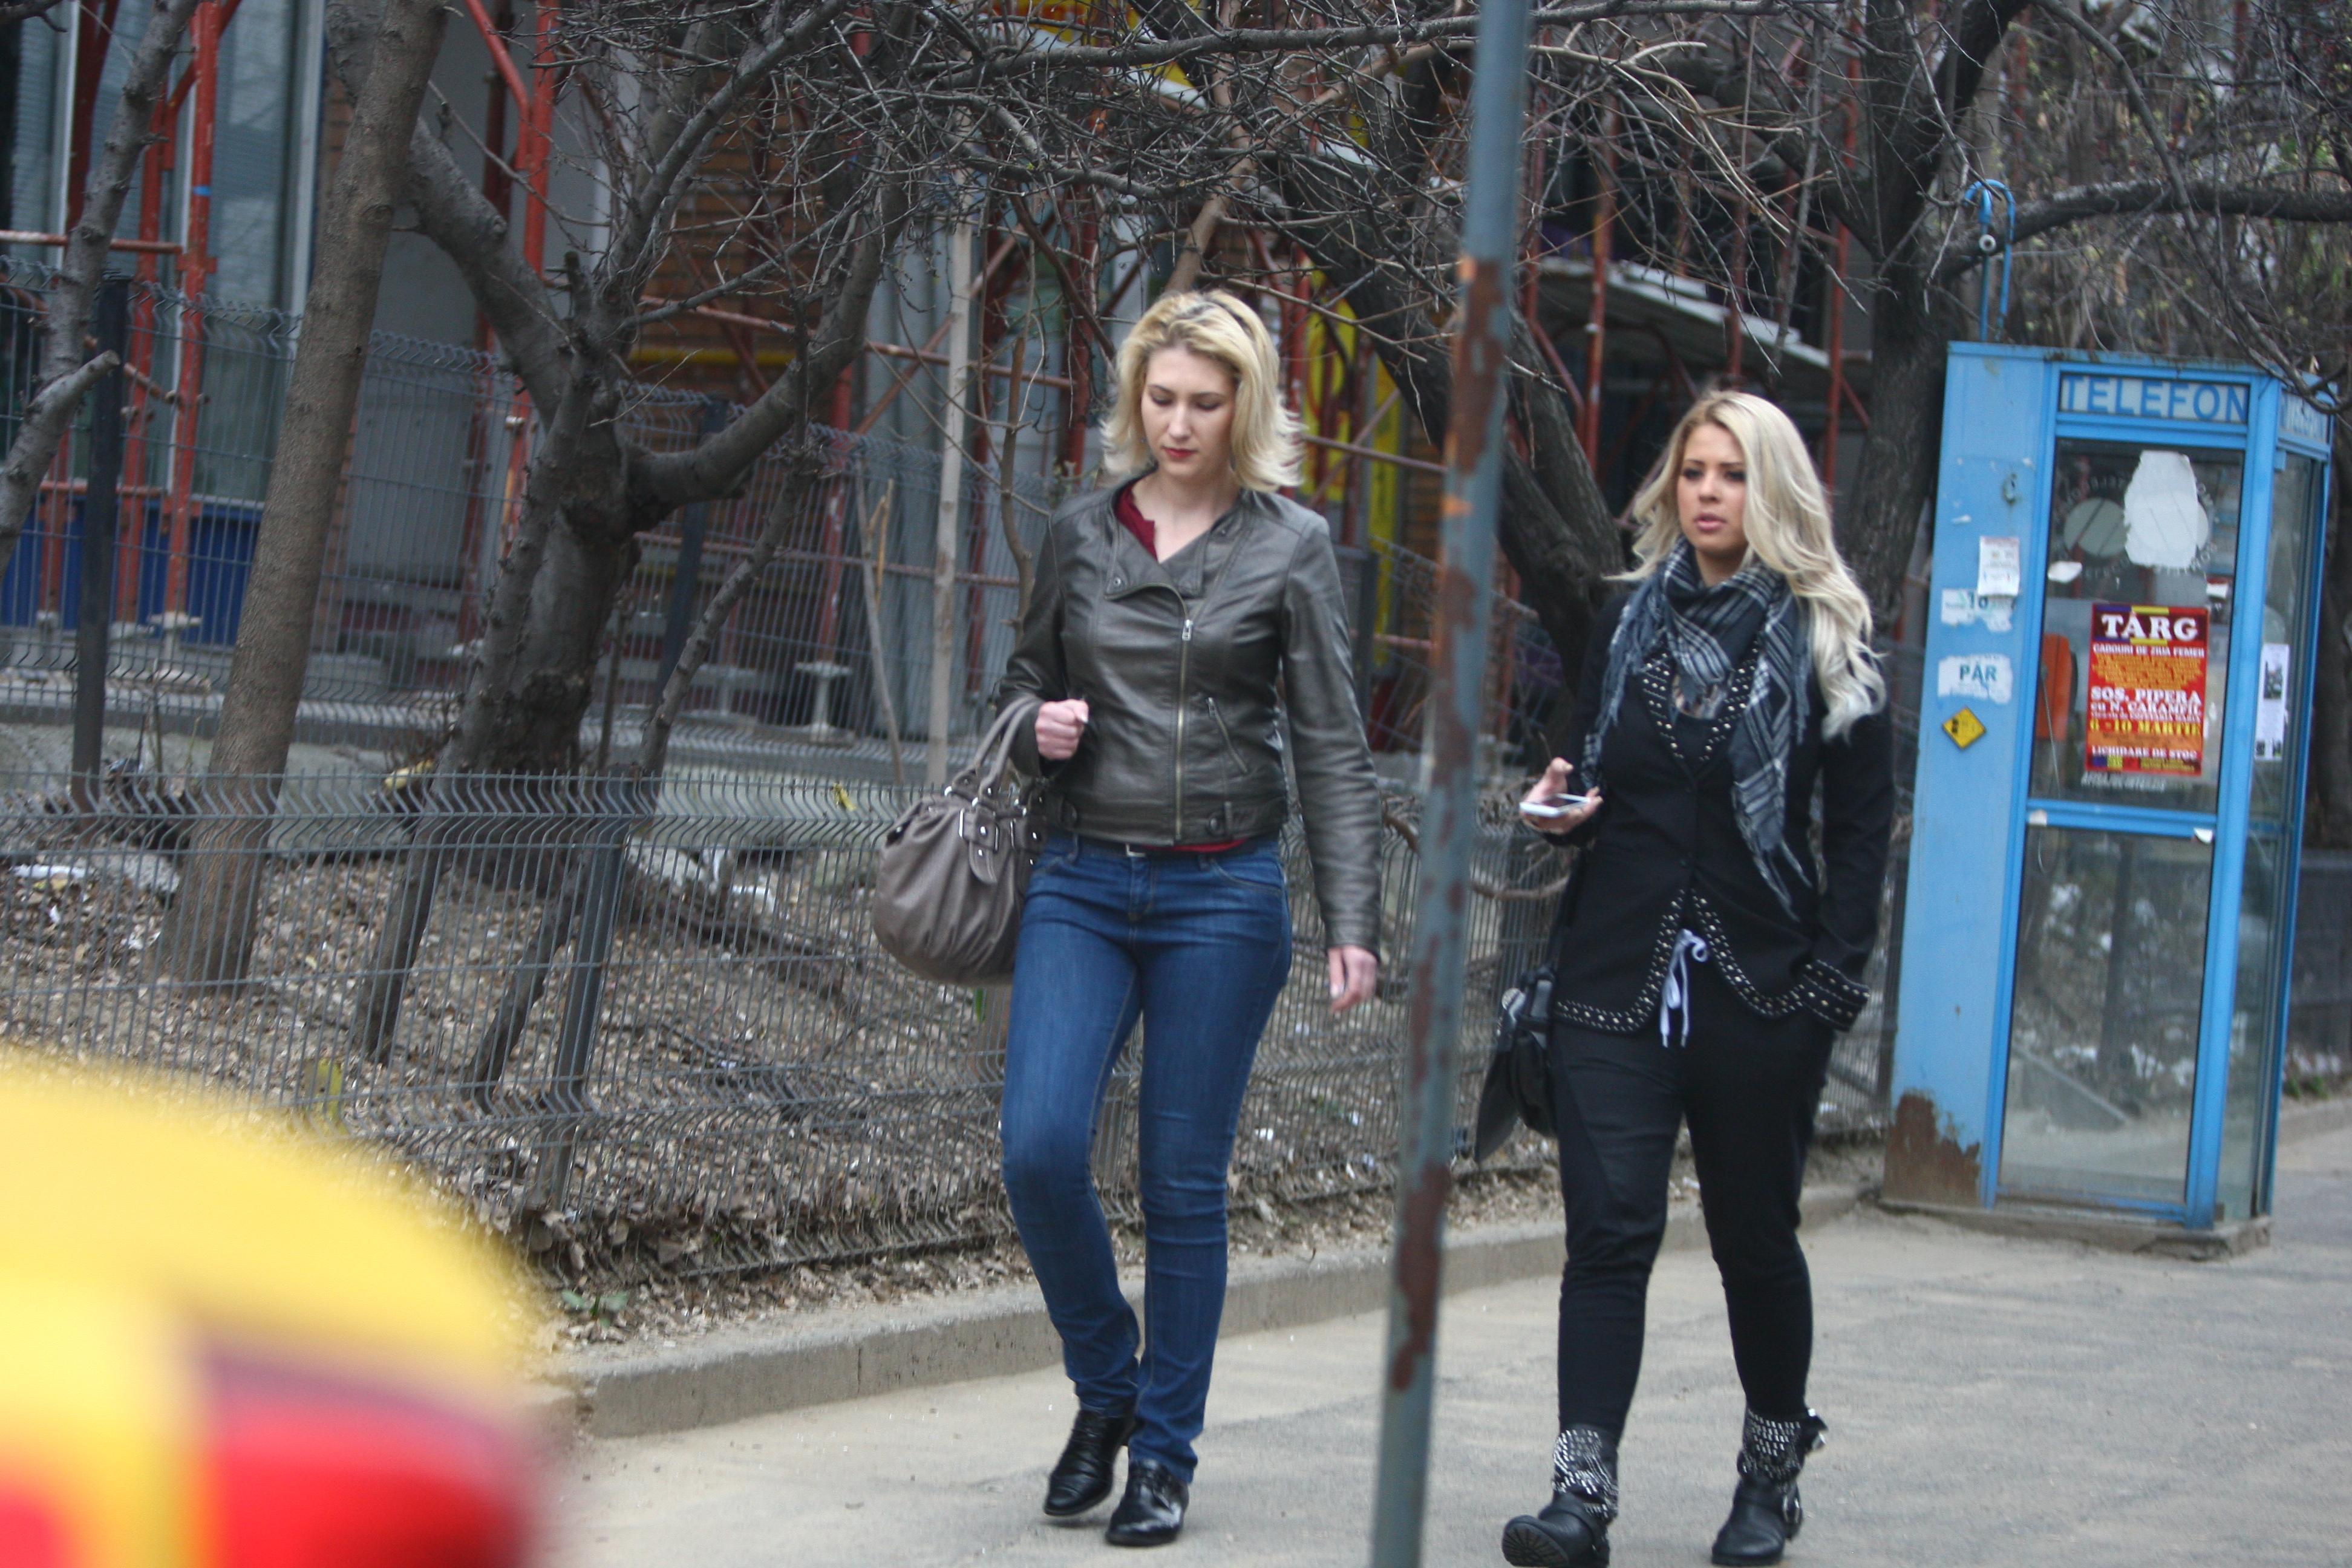 Cele doua blonde merg pe jos cautand o masina